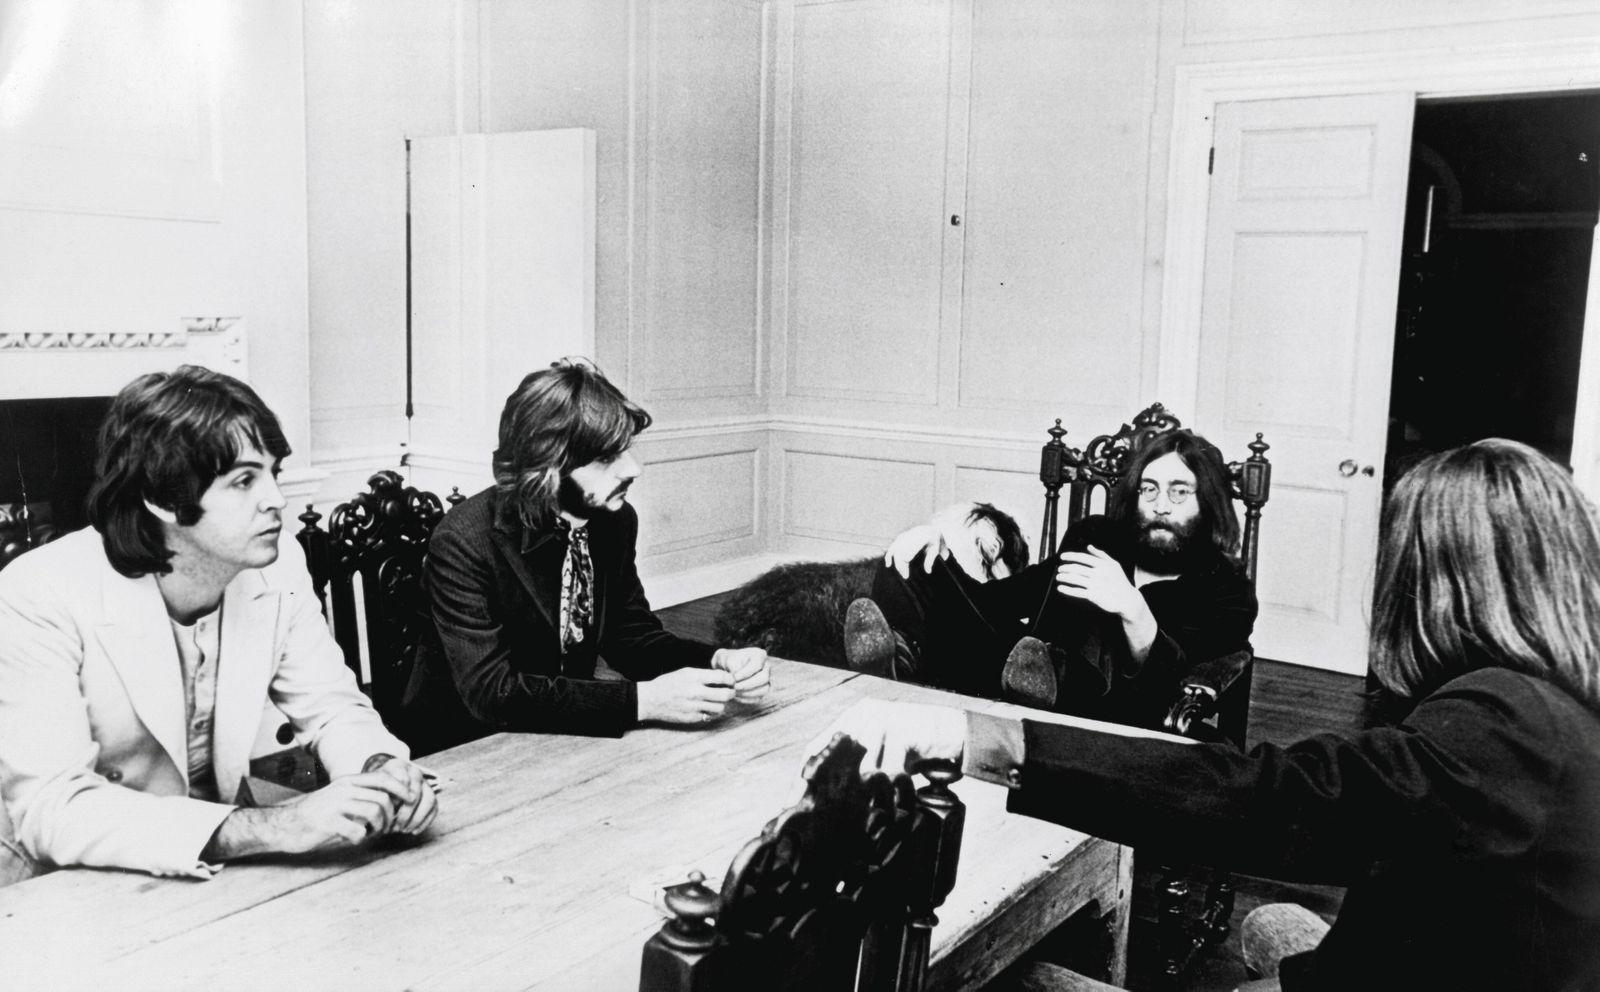 Beatles John Lennon George Harrison Paul McCartney and Ringo Starr circa 1969 PUBLICATIONxINxGER